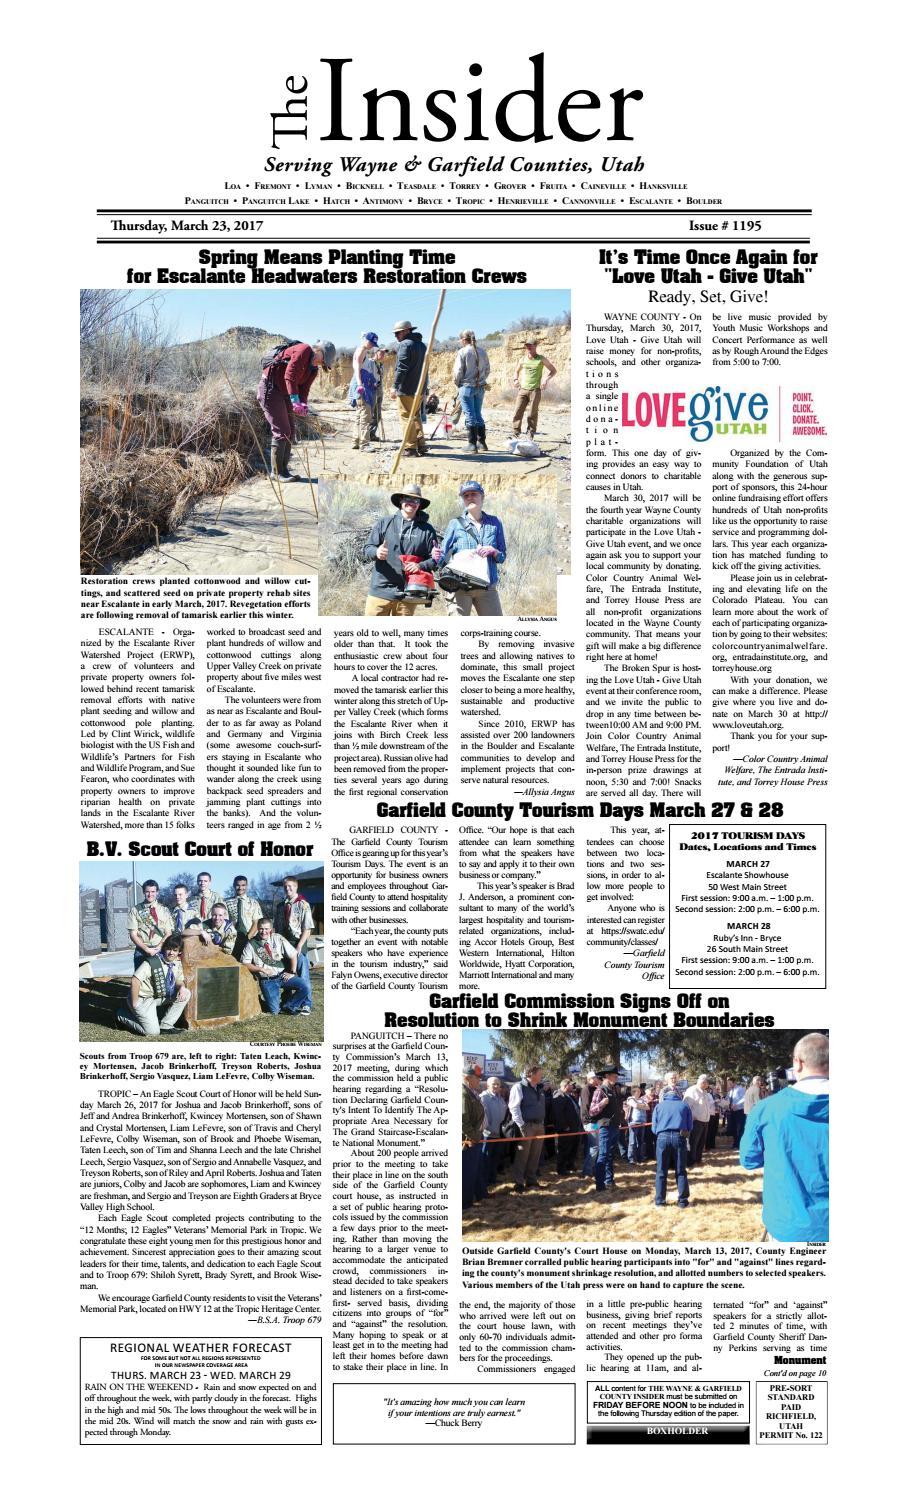 The Wayne and Garfield County Insider 03/23/2017 by Snapshot